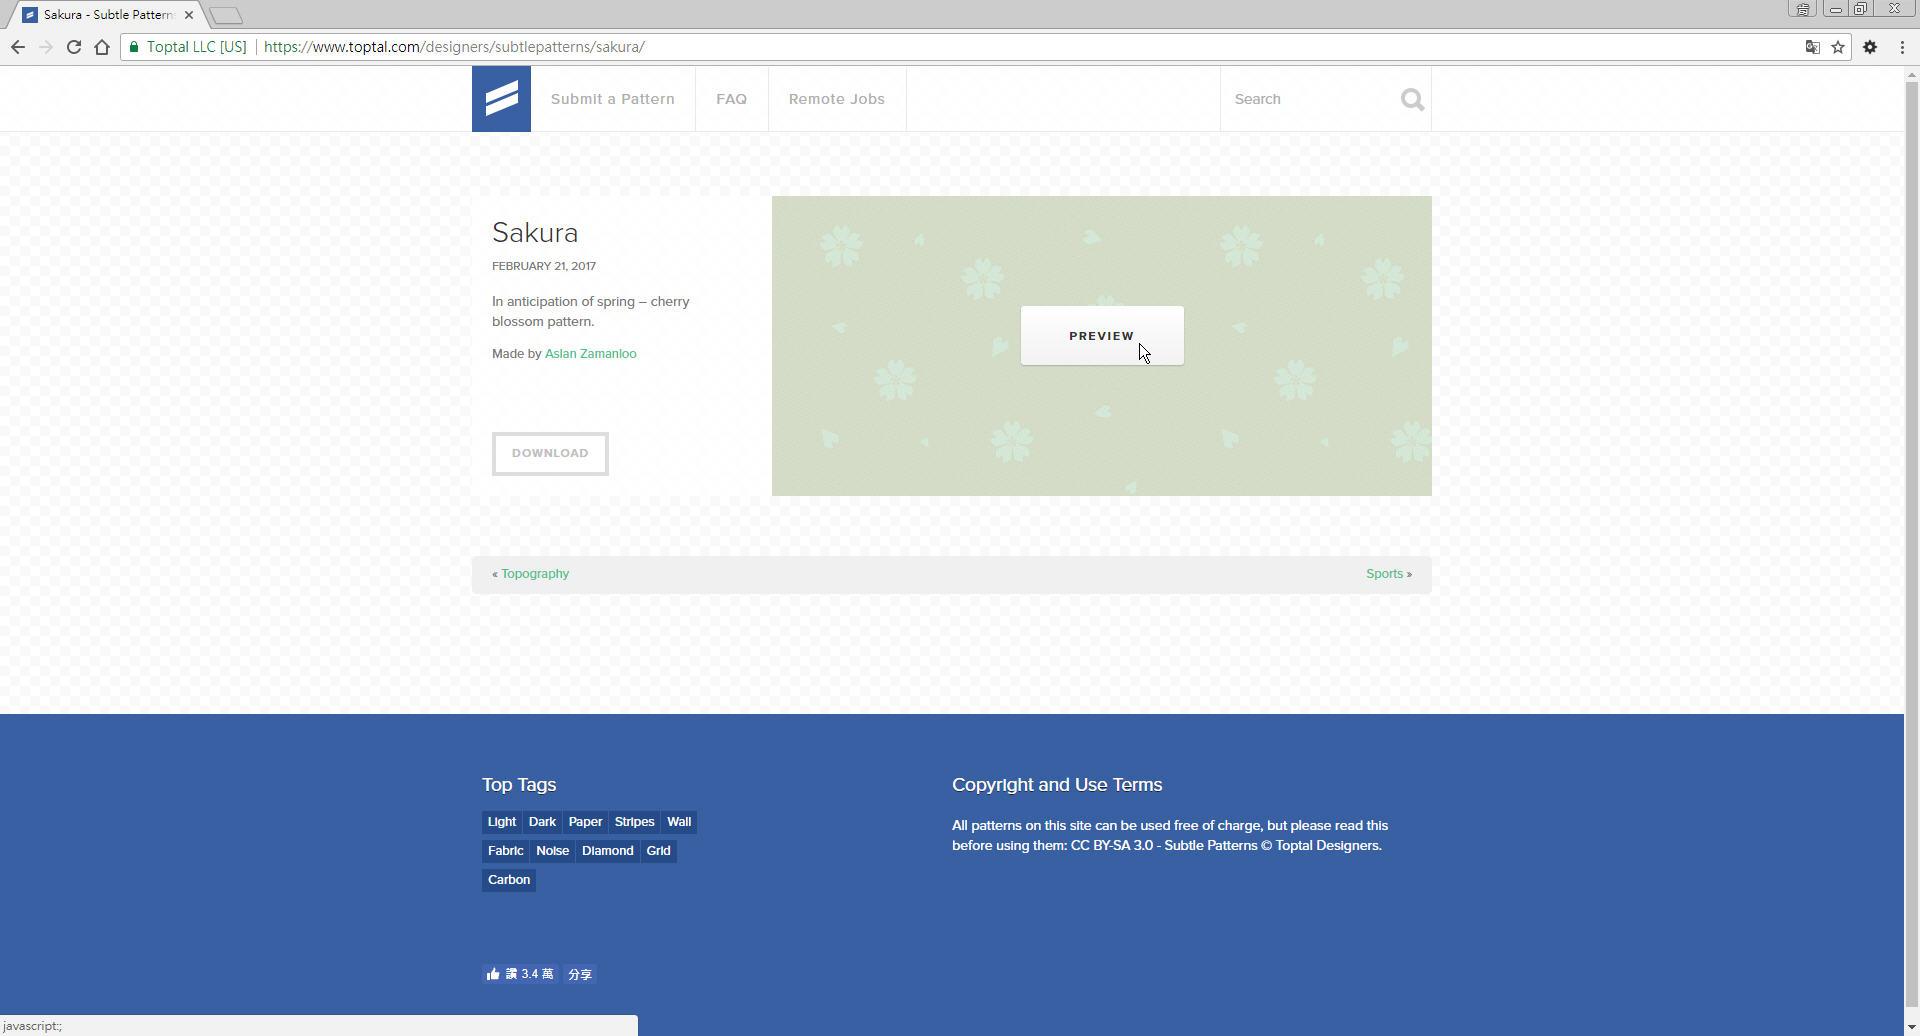 Free Resource 好康報報 Good Design 好站報報  - 【設計資源】Subtle Patterns - 免費下載之 pattern 素材網站 - p-6